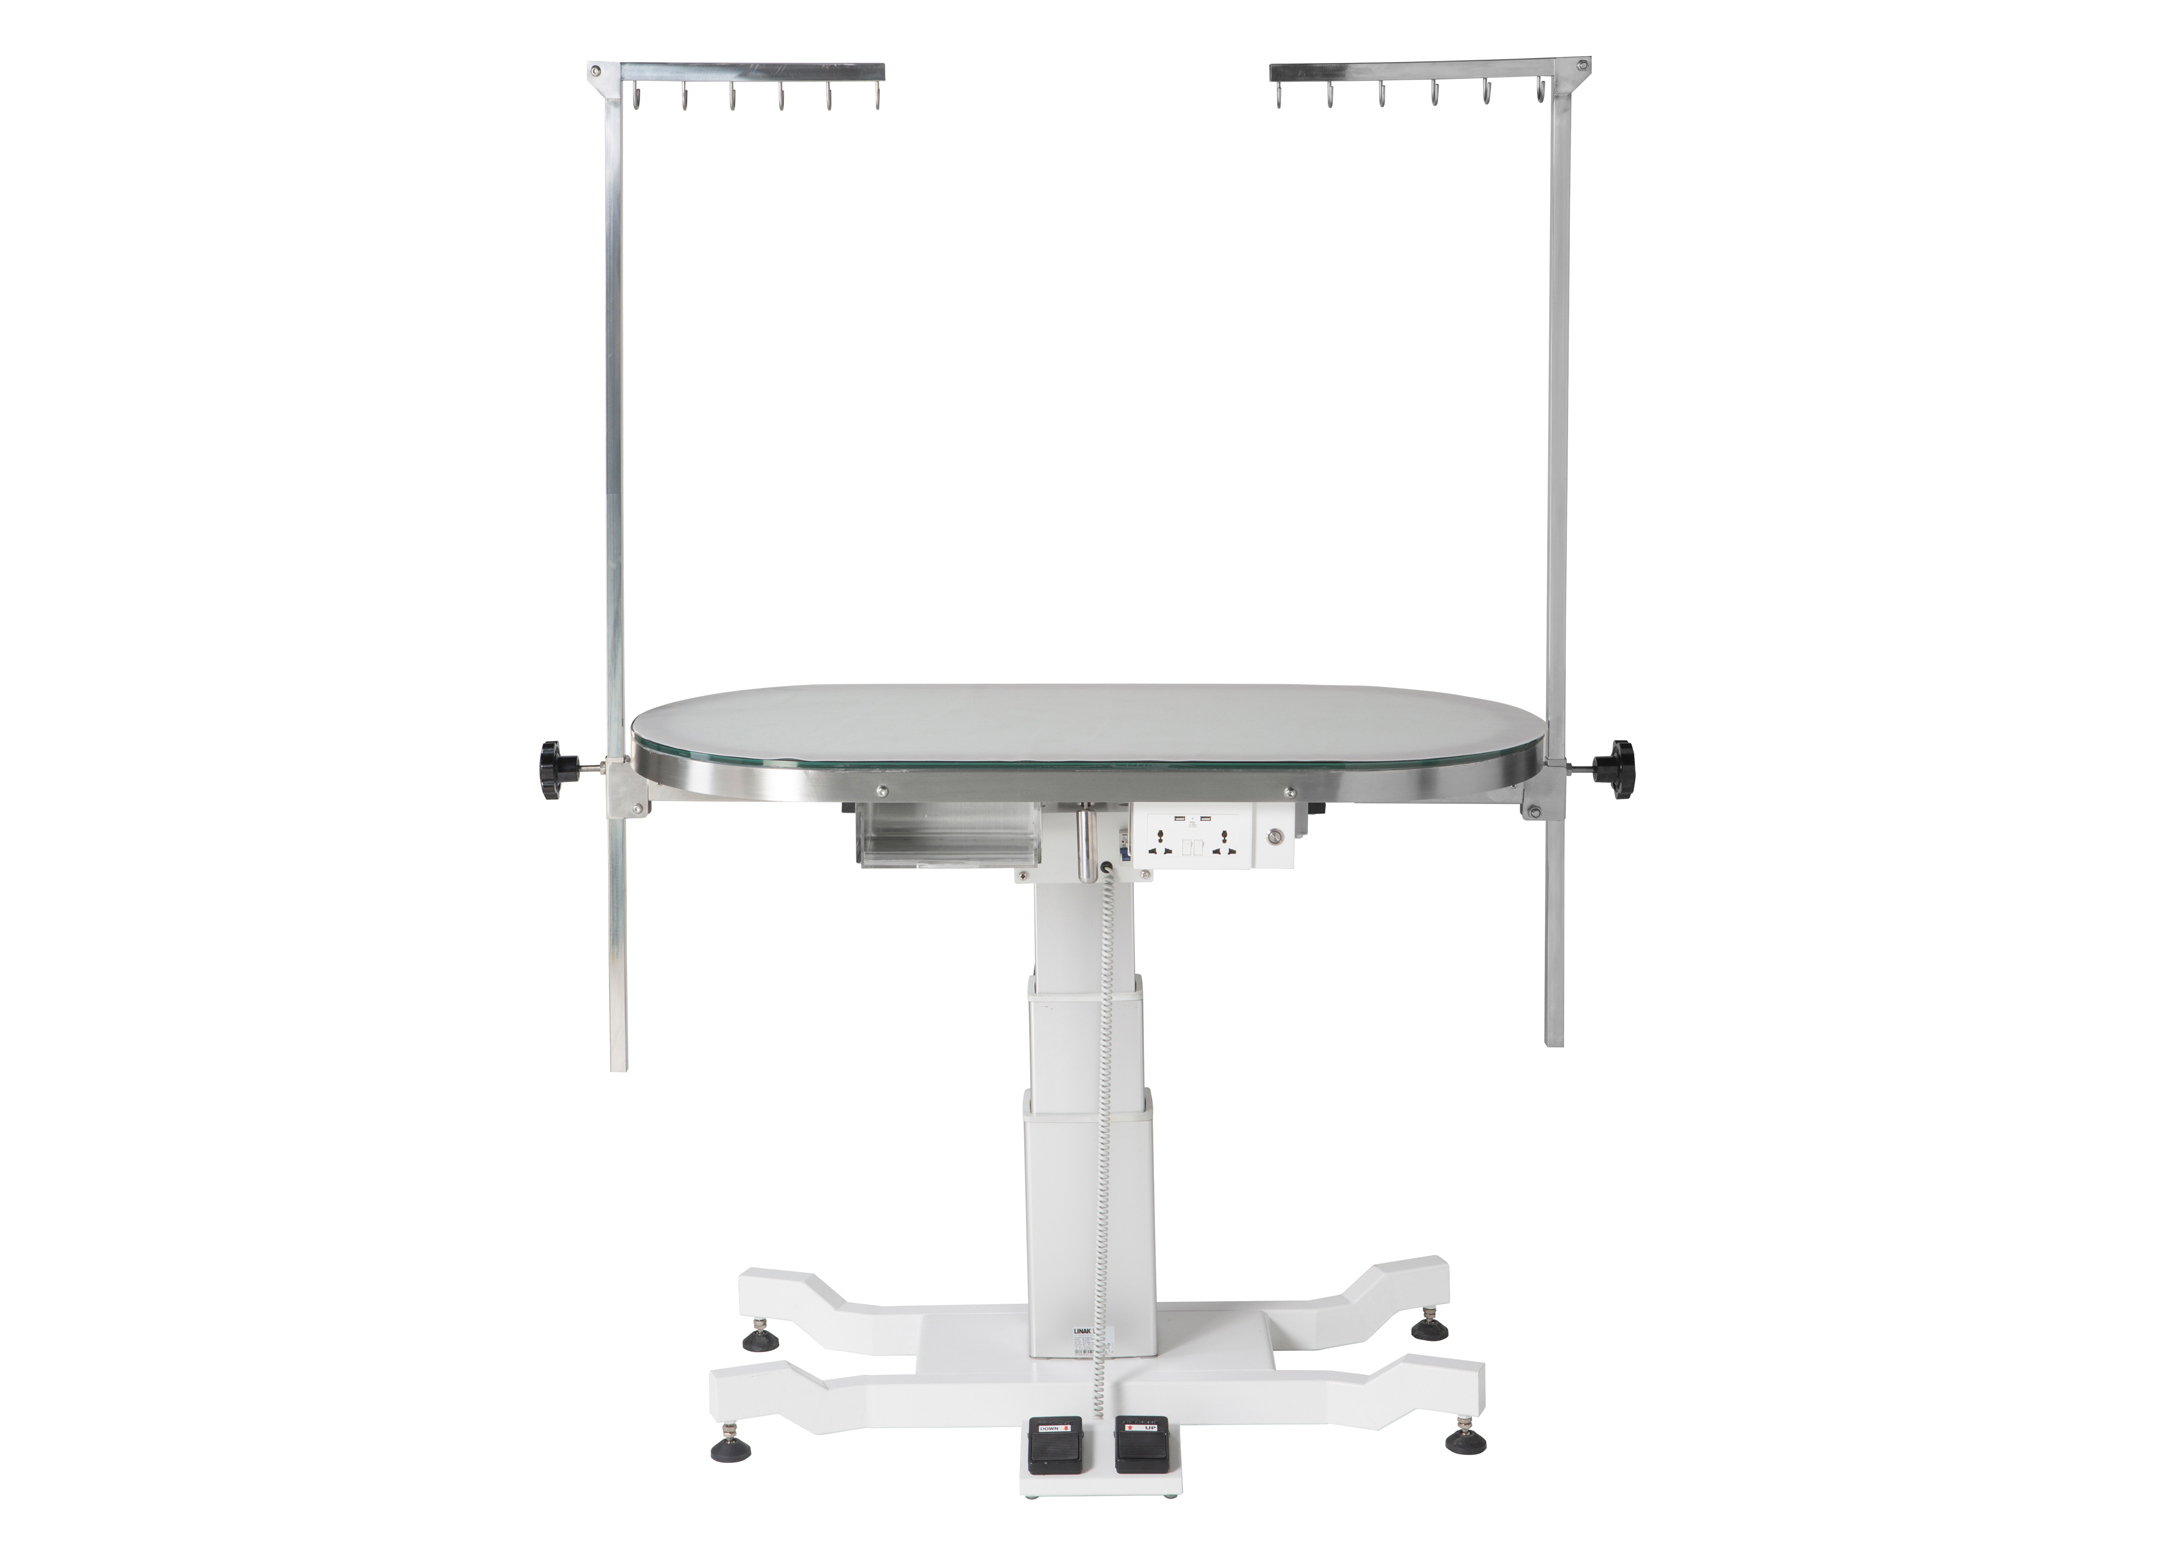 Groom-X Kitty's Table de Toilettage Tournante Electrique 120x60x61,5-102cmh